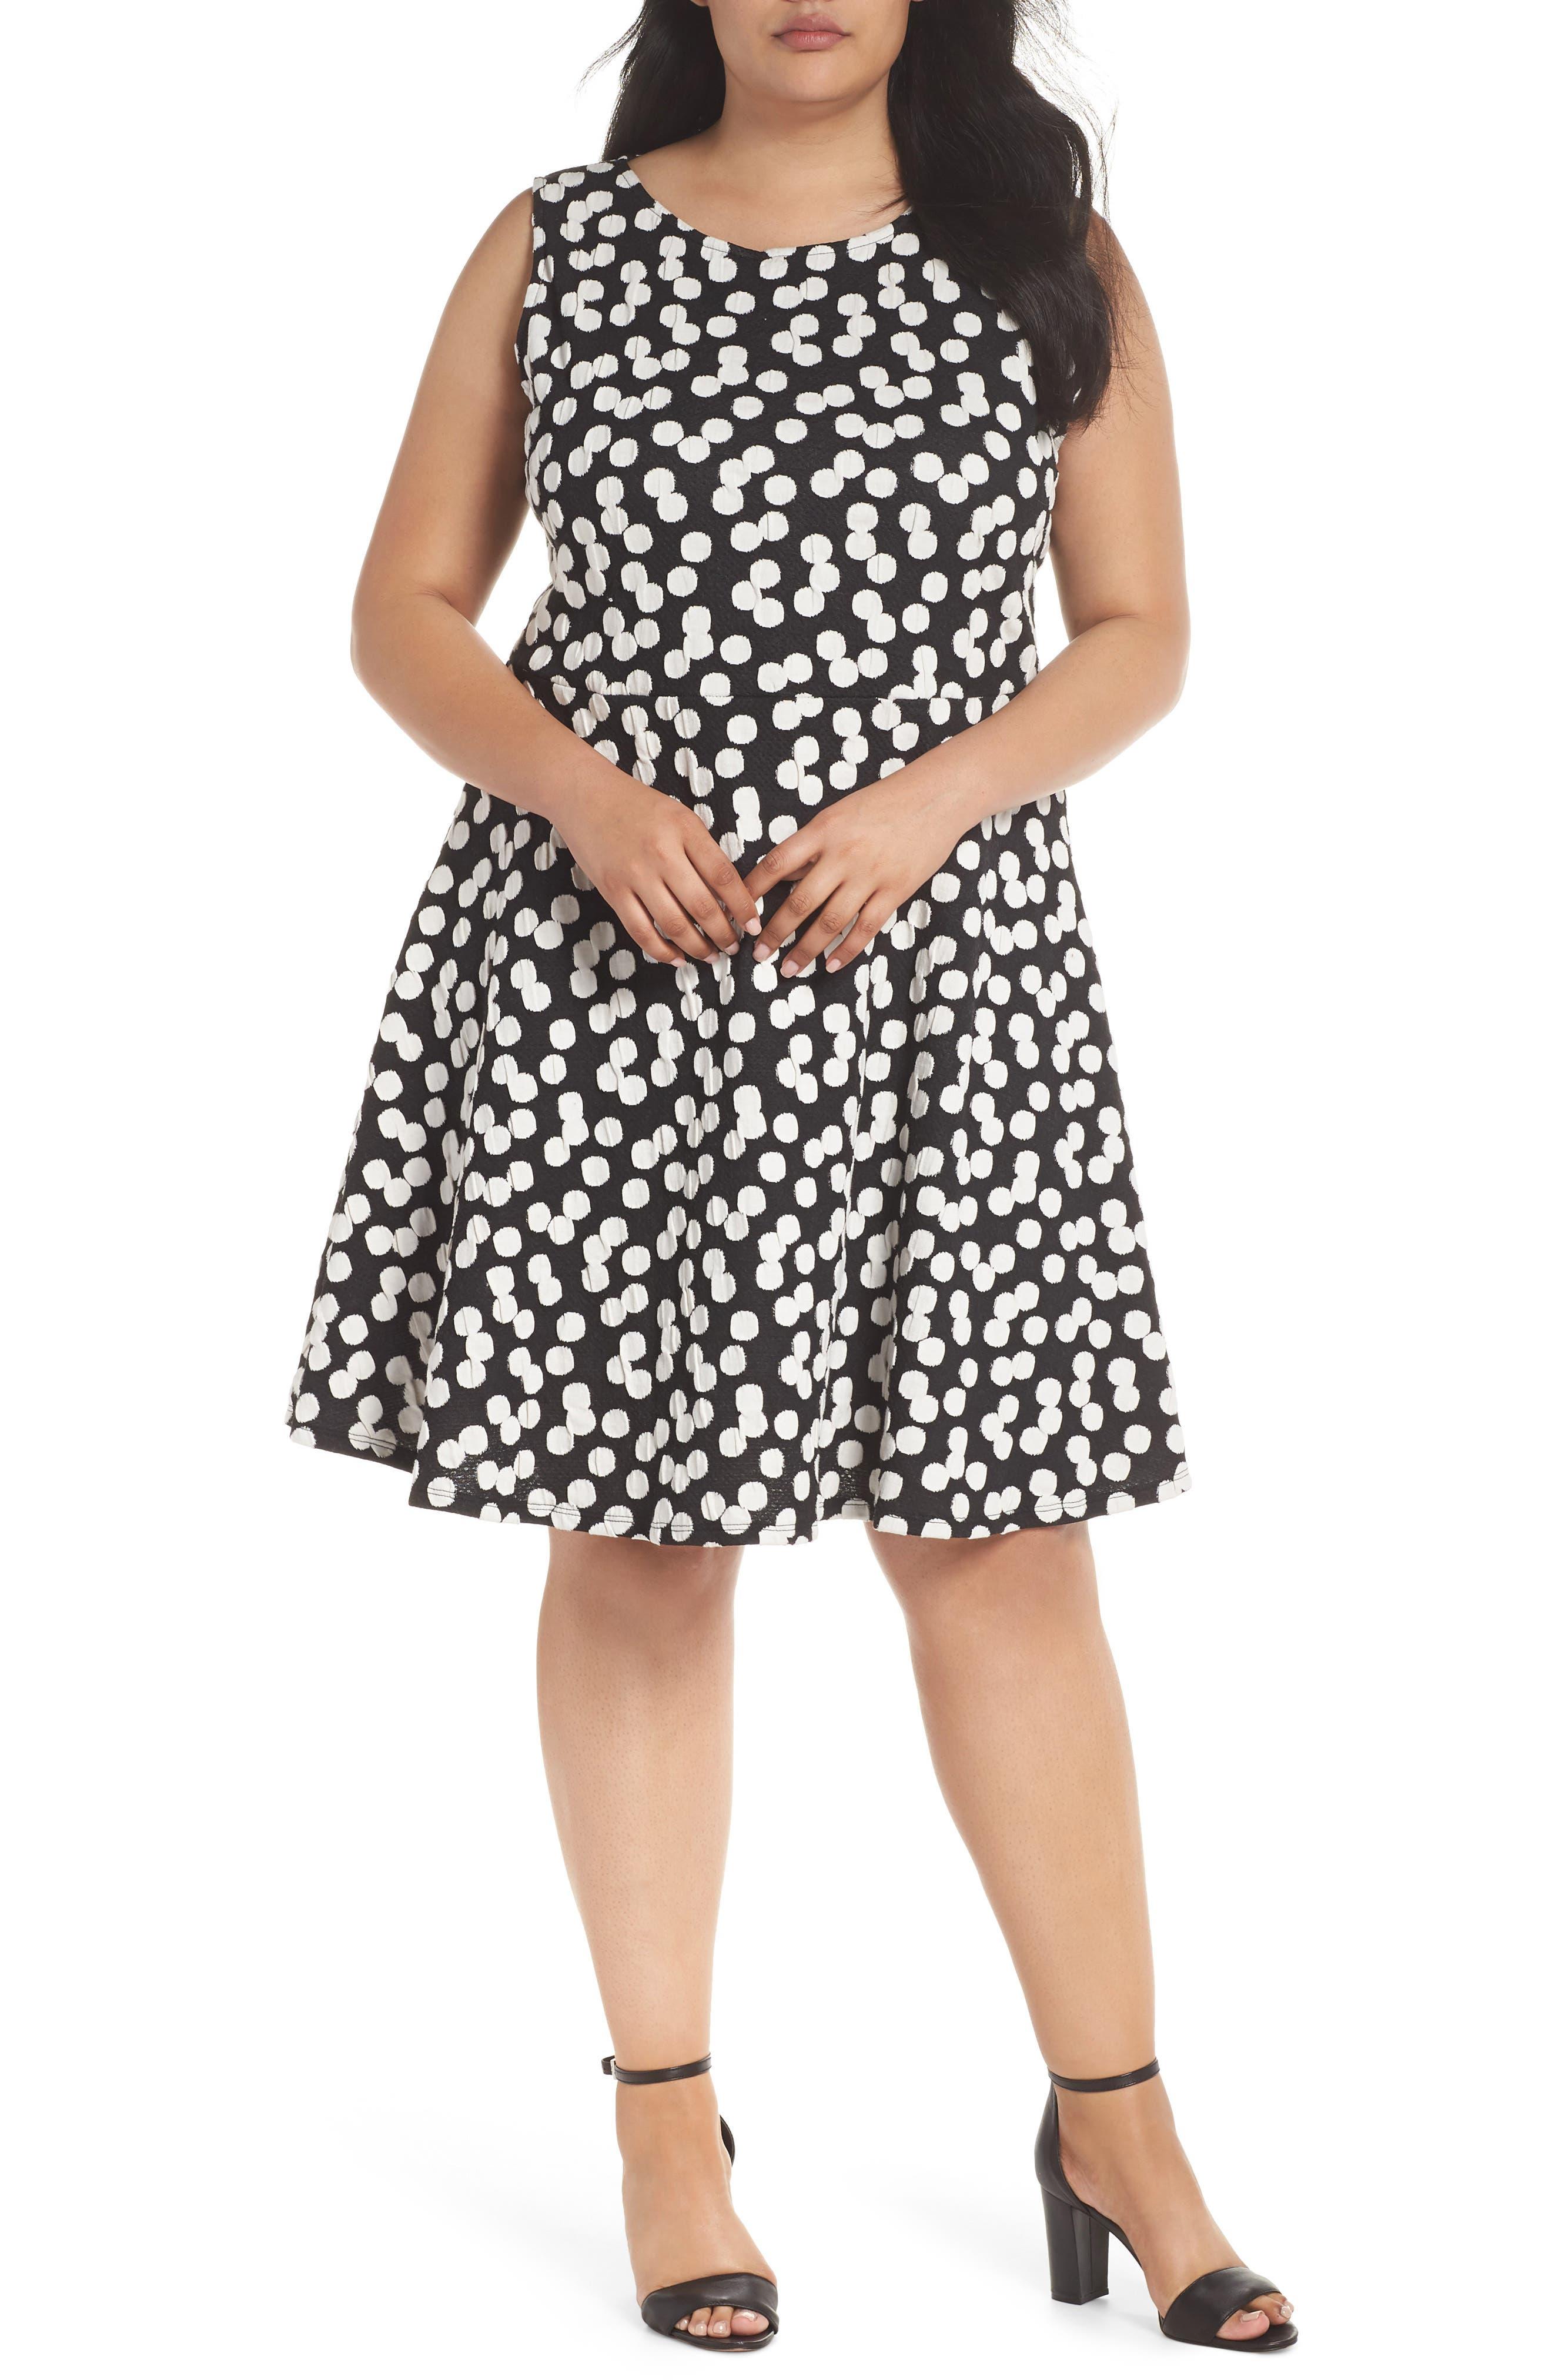 Main Image - Leota Ava Fit & Flare Dress (Plus Size)